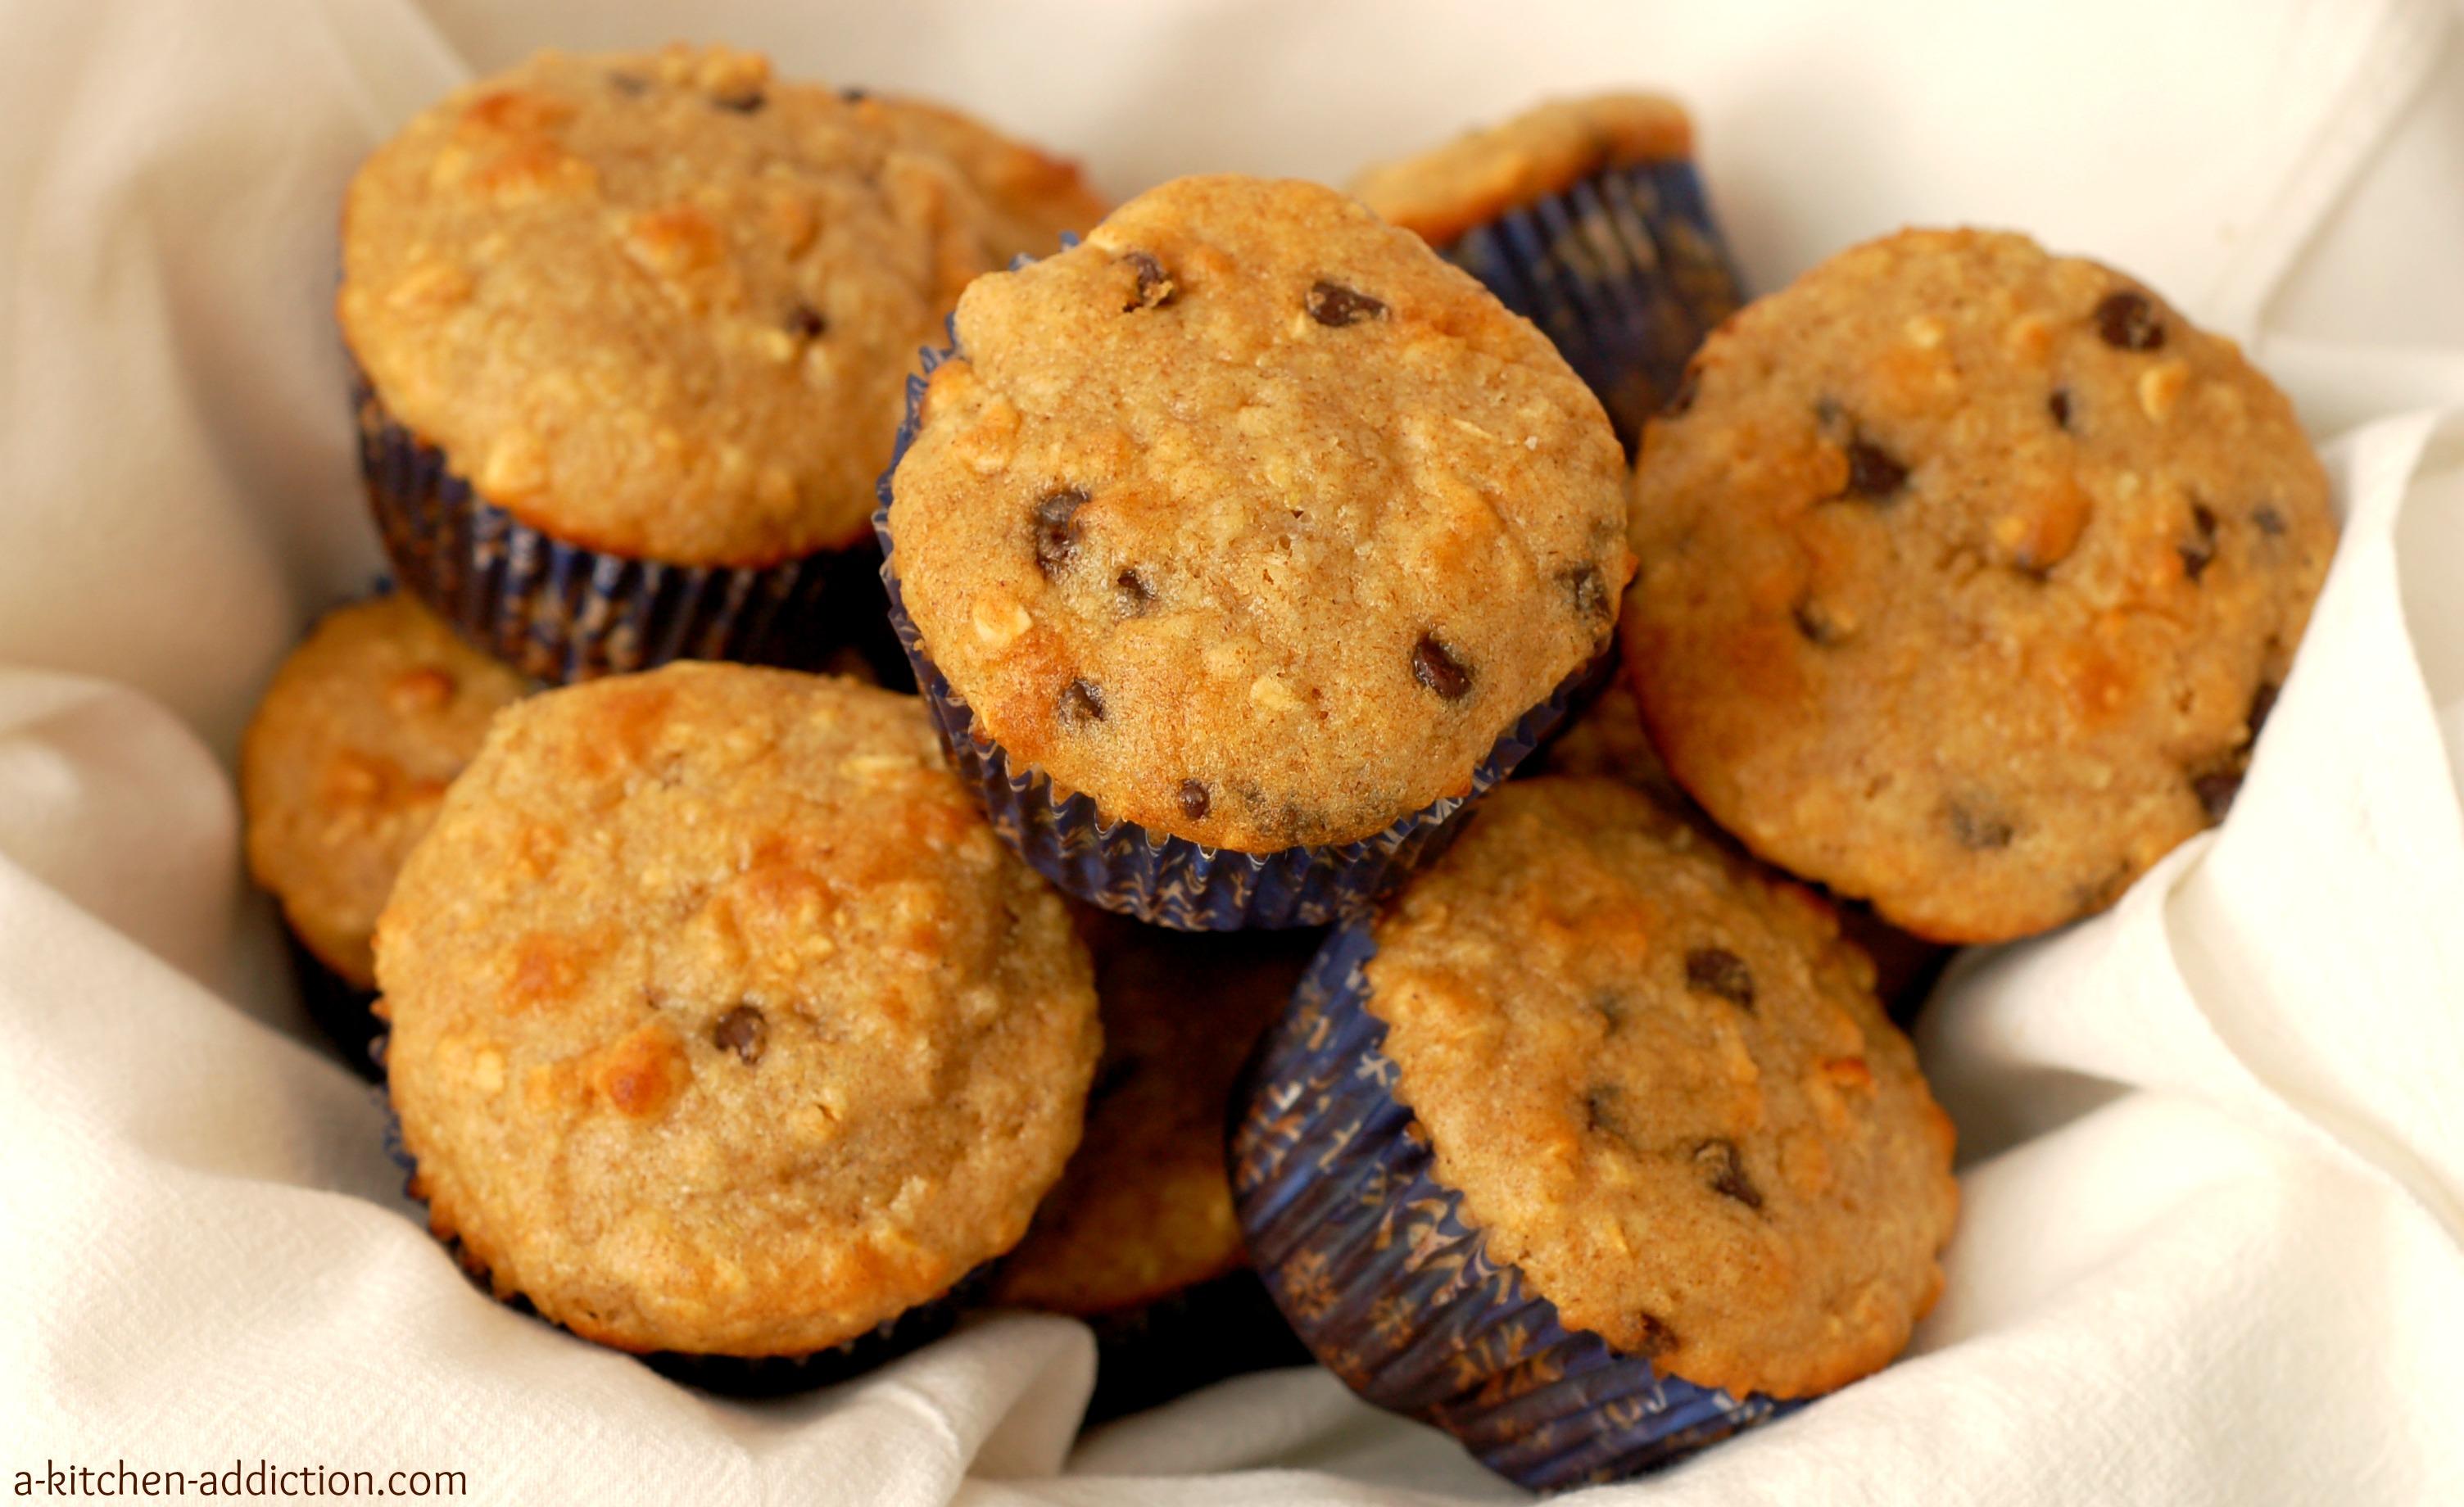 choc-chip-yogurt-oat-muffins-UC-w-name.jpg